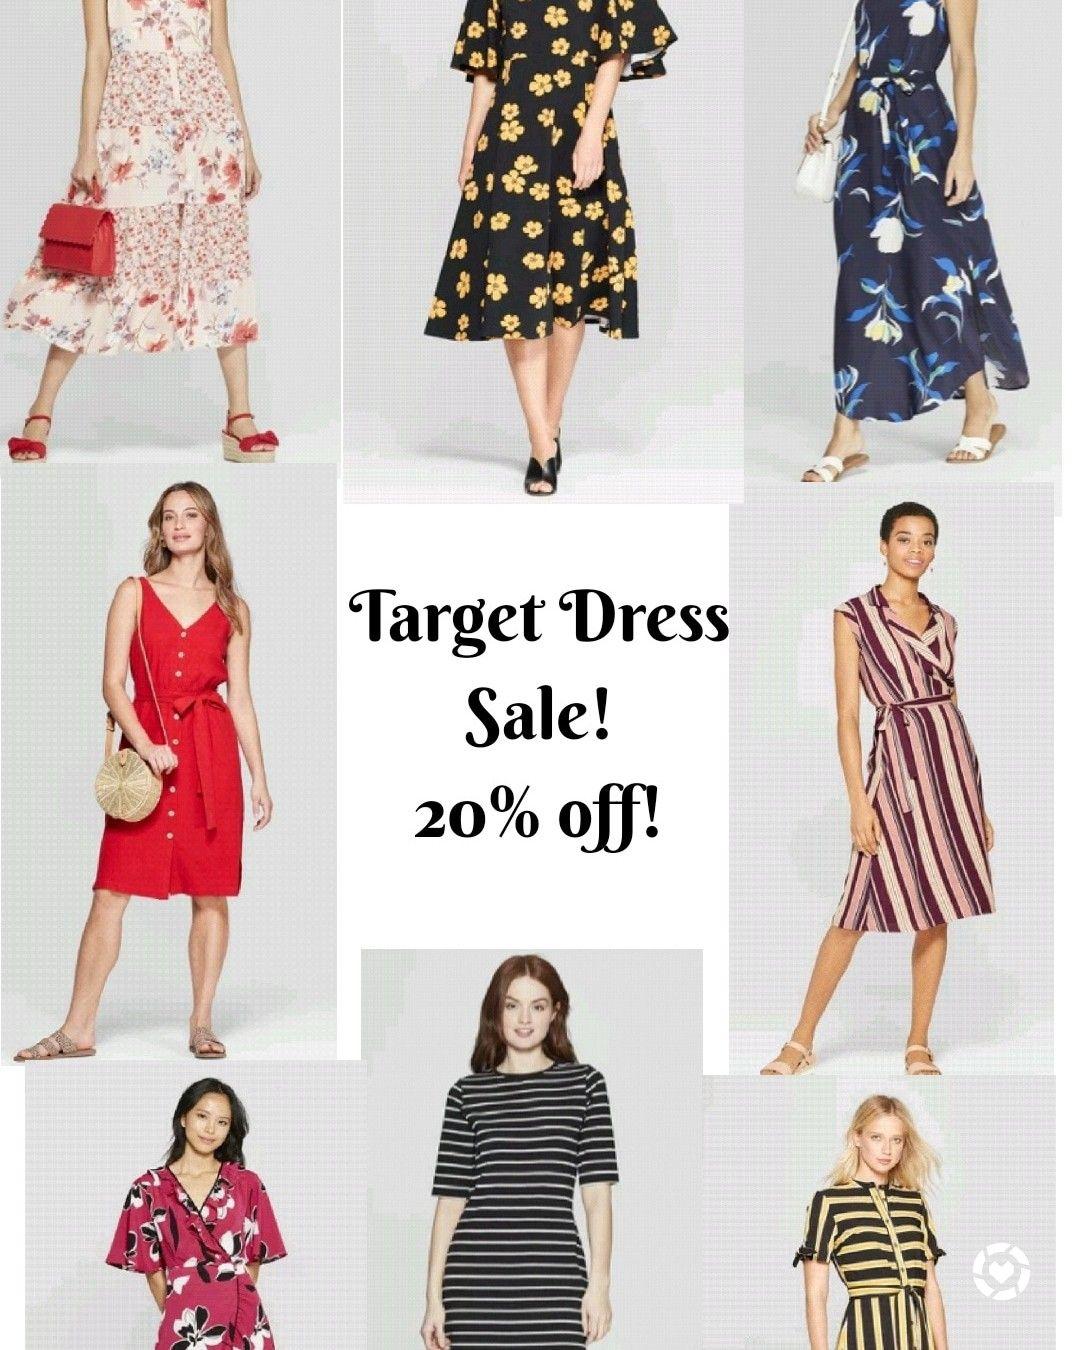 Target Dresses Are 20 Off Here S My Faves Http Liketk It 2bu8a Liketoknow It Liketkit Mini Dress Casual Plain Dress Casual Floral Dress Casual [ 1350 x 1080 Pixel ]